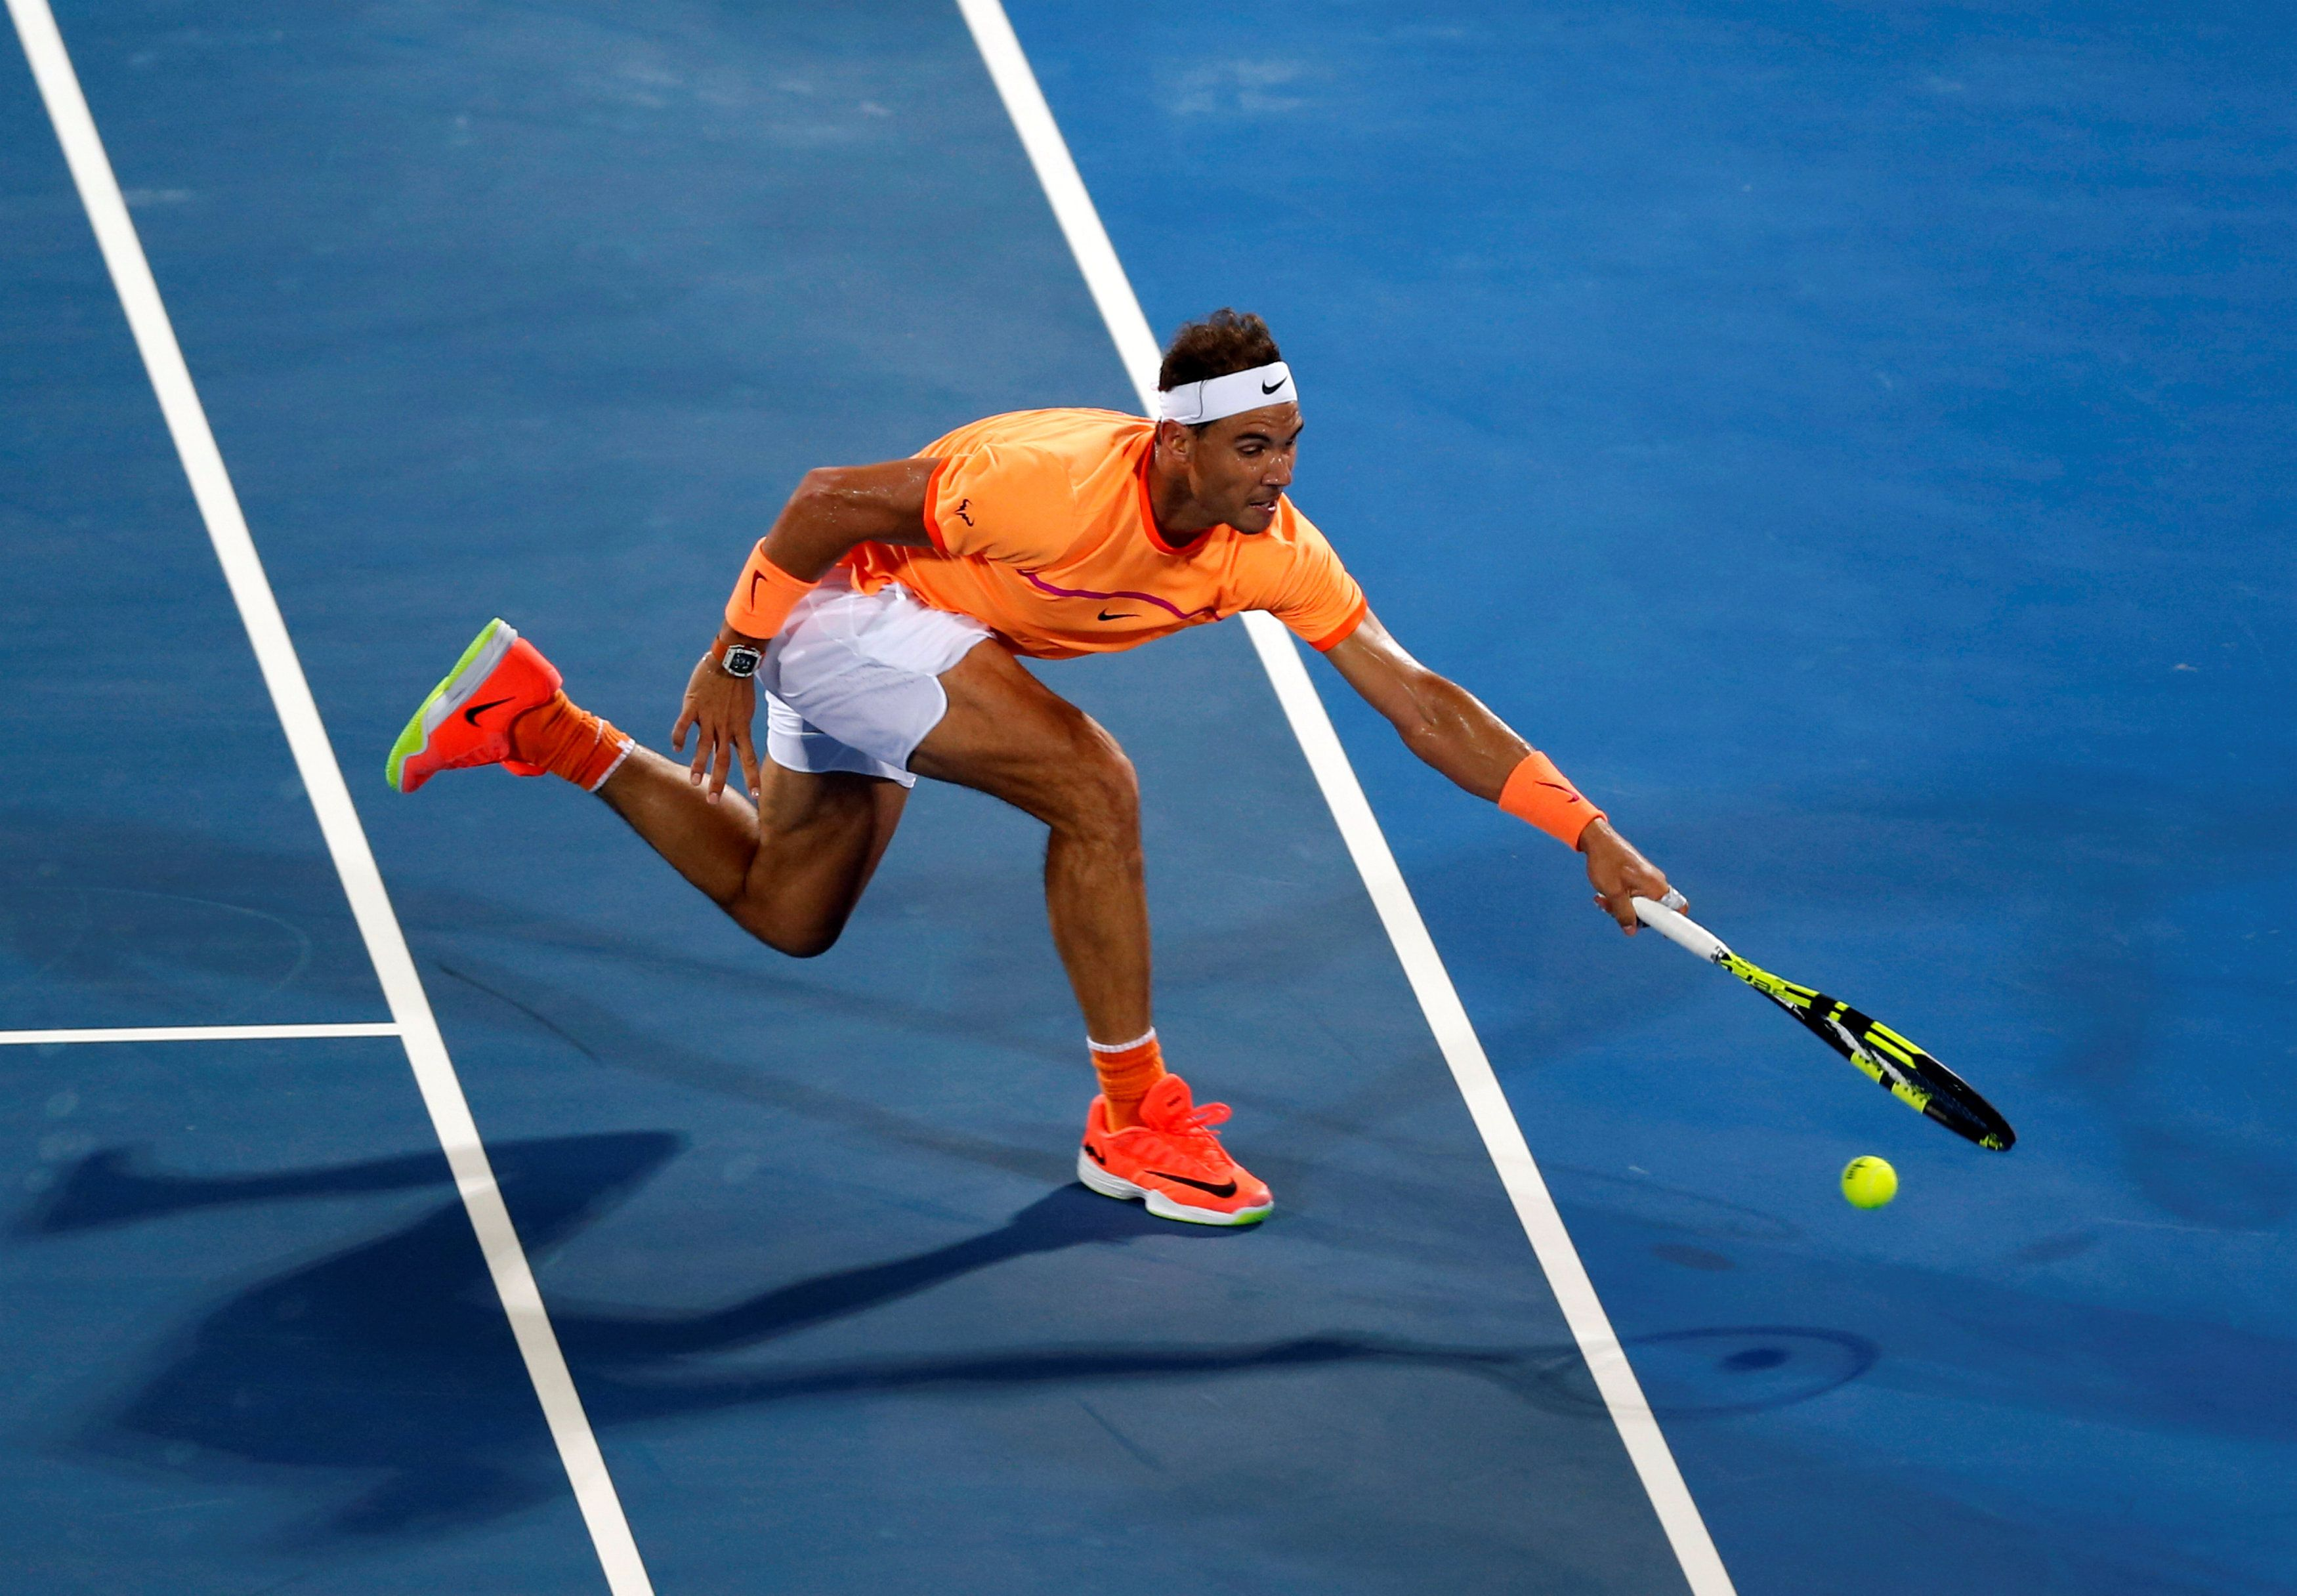 Rafa in action during his men's singles match against Tomas Berdych Abu Dhabi Getty Rafa Nadal